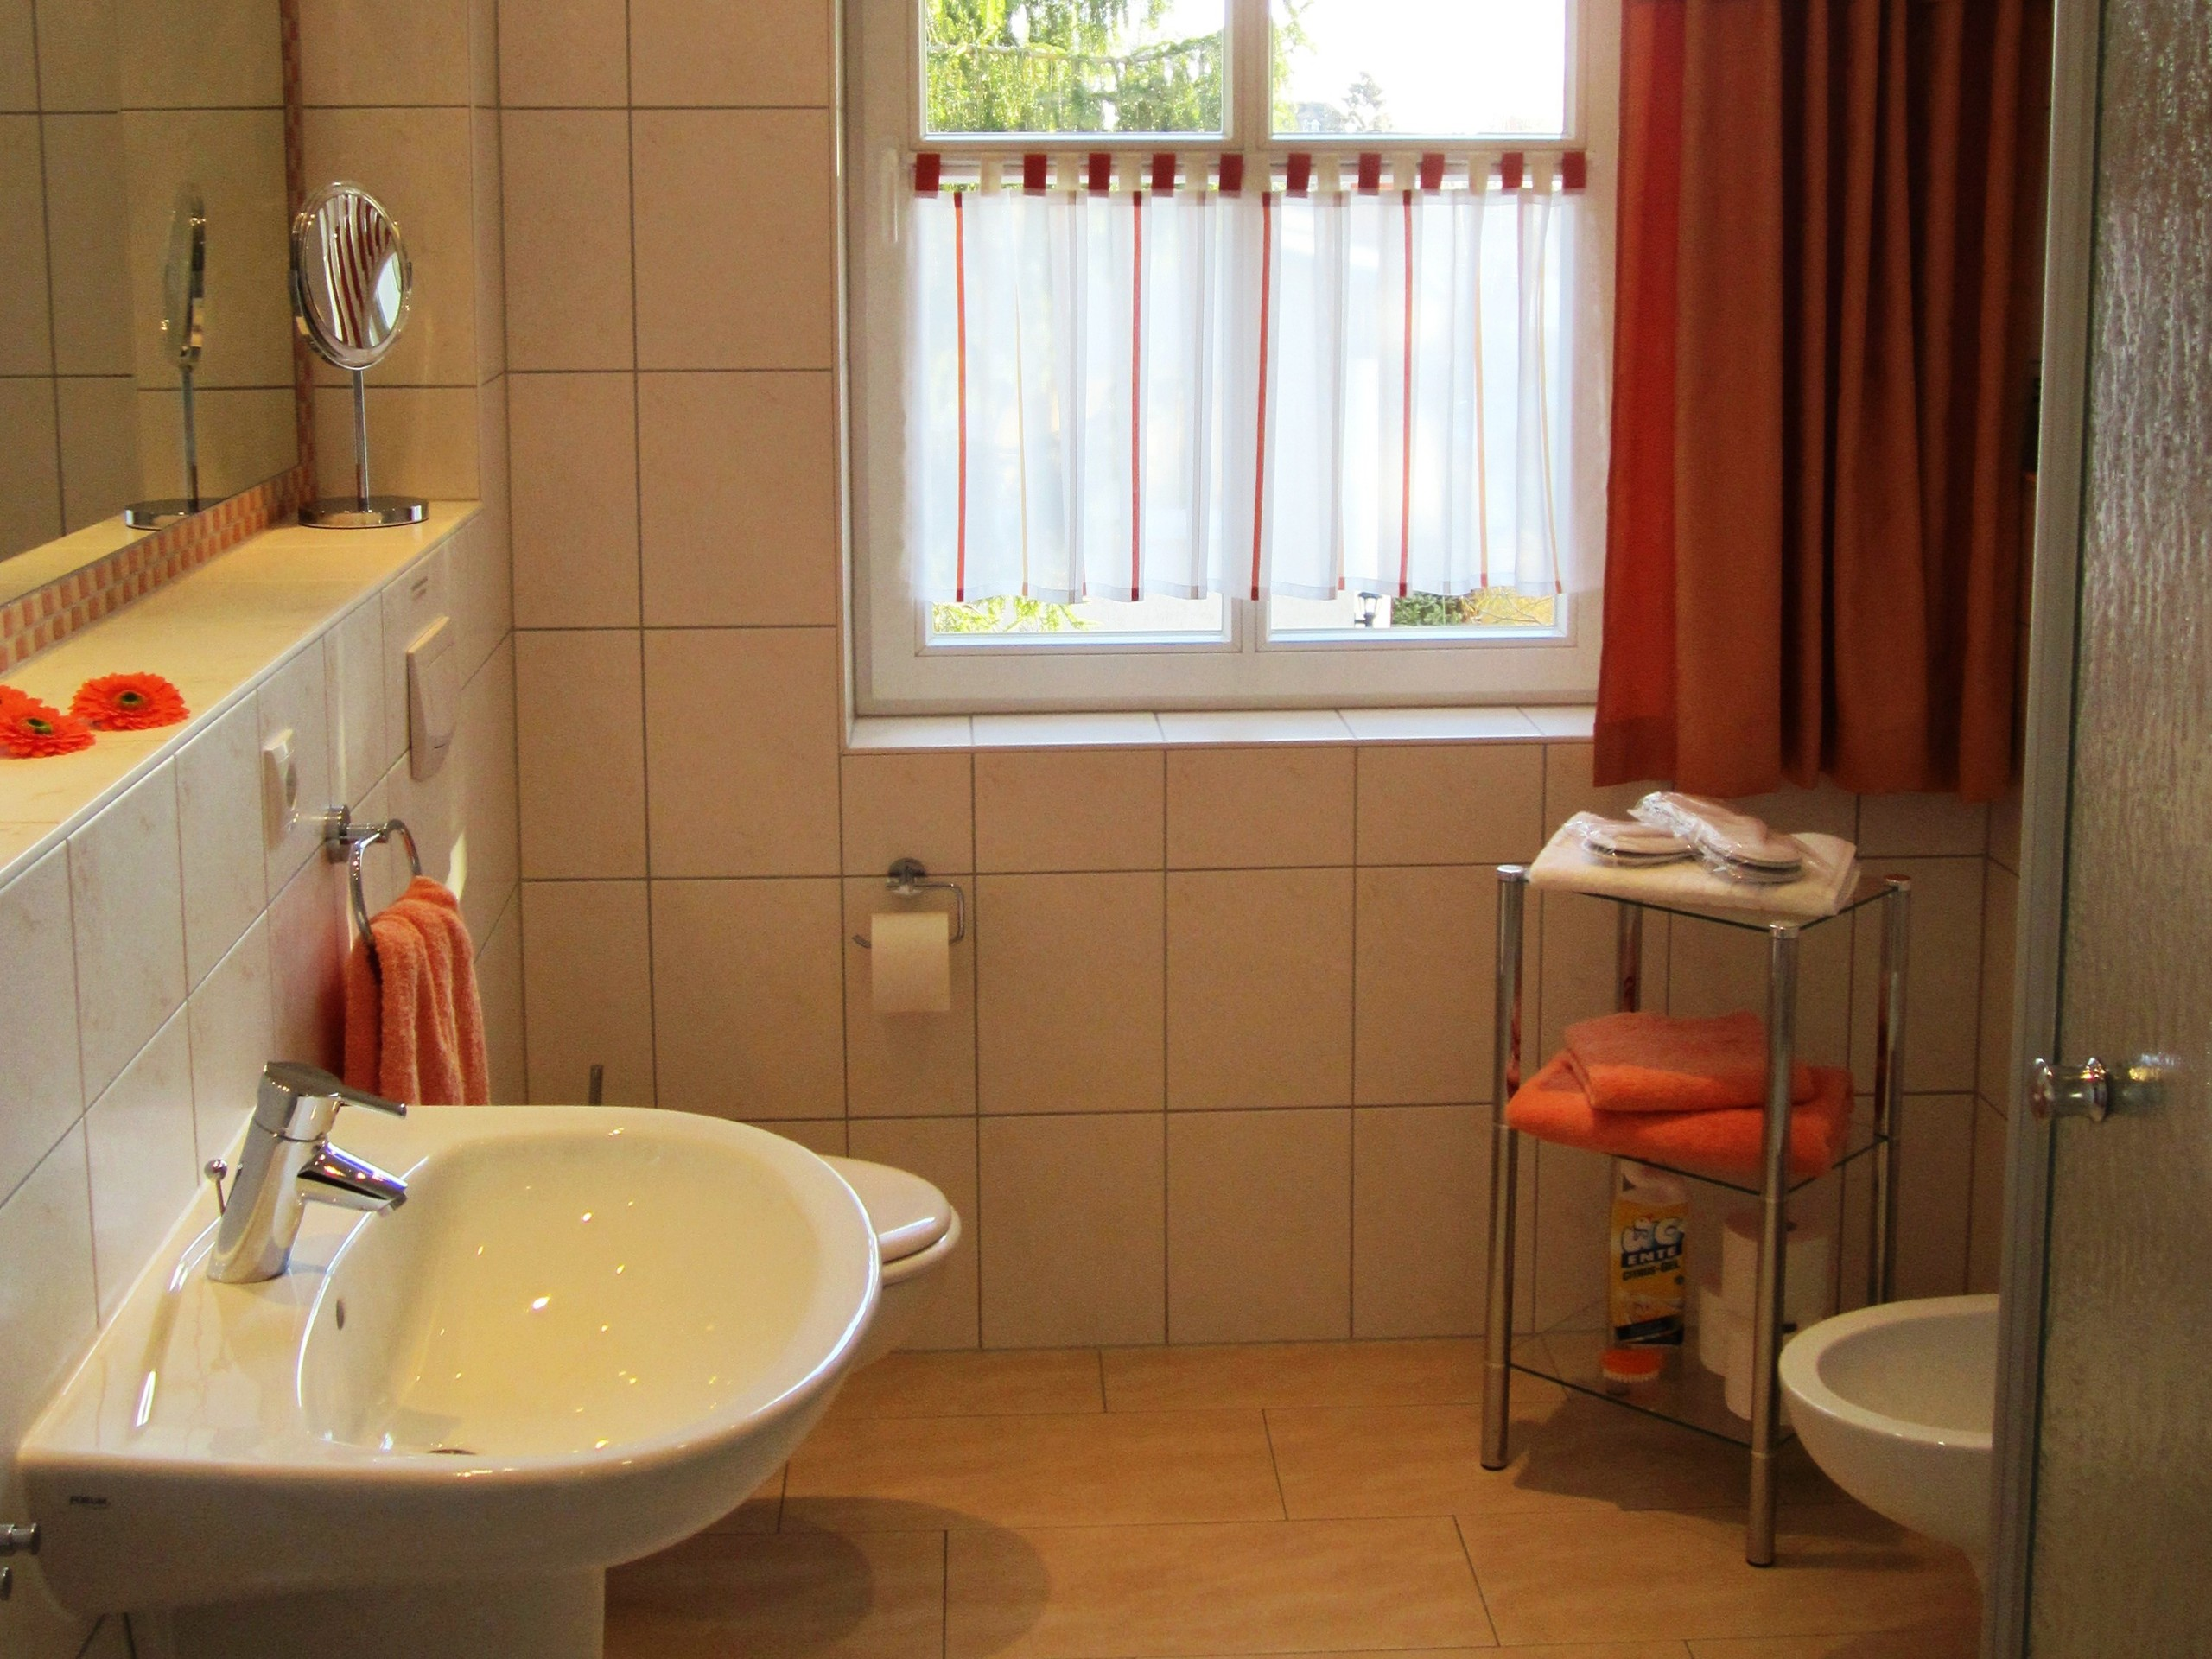 Sauberes und geräumiges Bad im OG